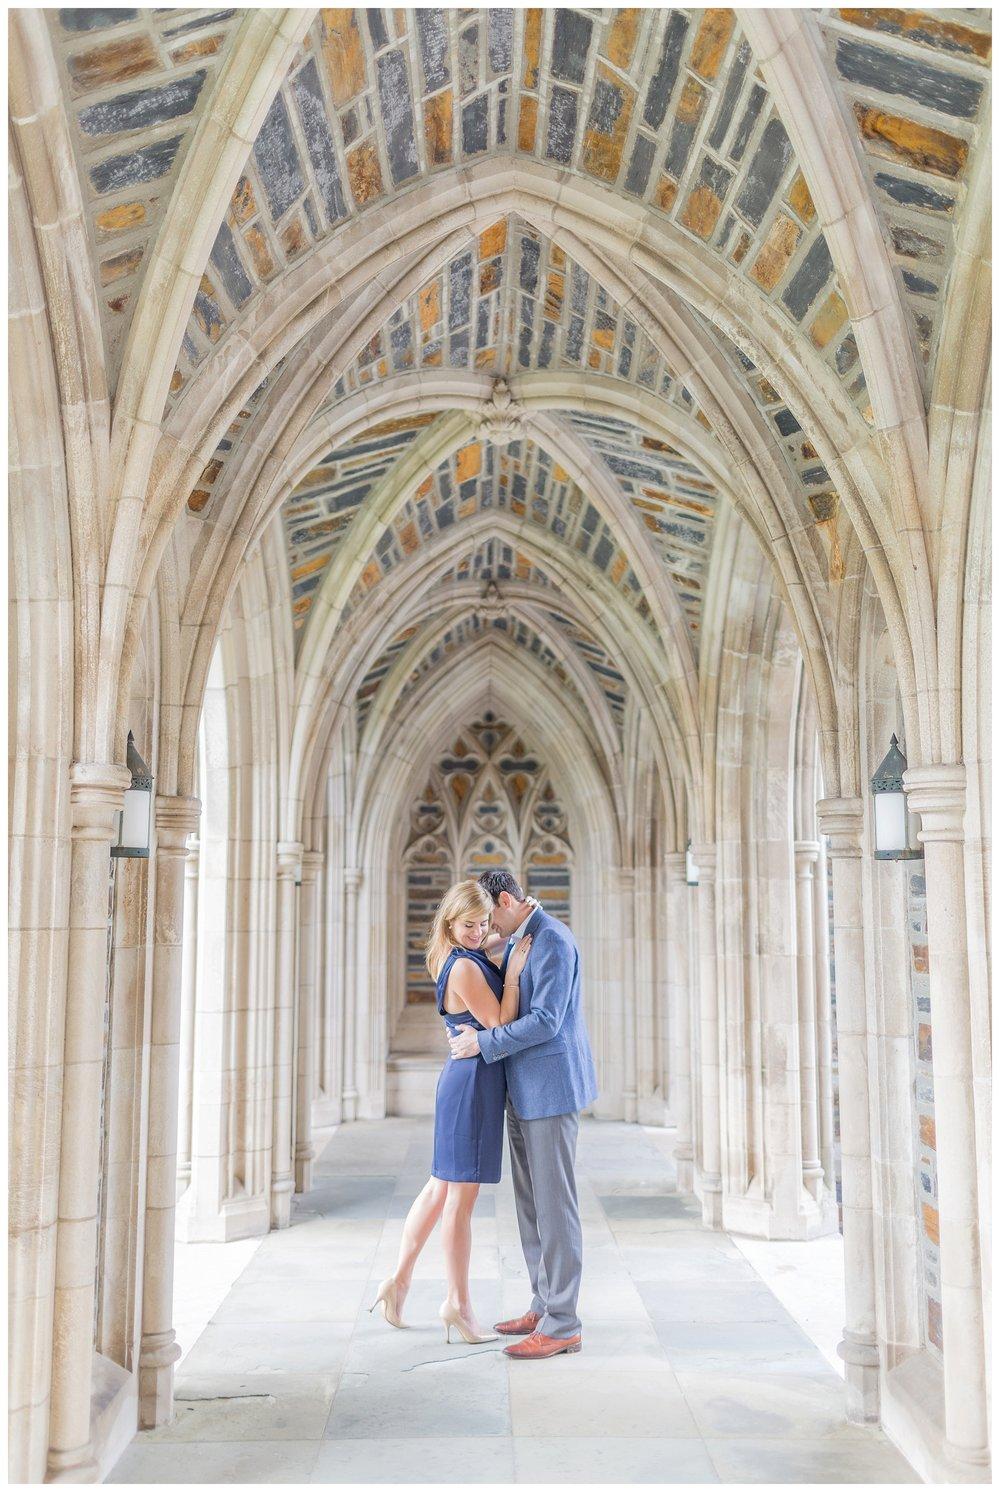 duke-university-engagement-durham-wedding-photographer_0008.jpg